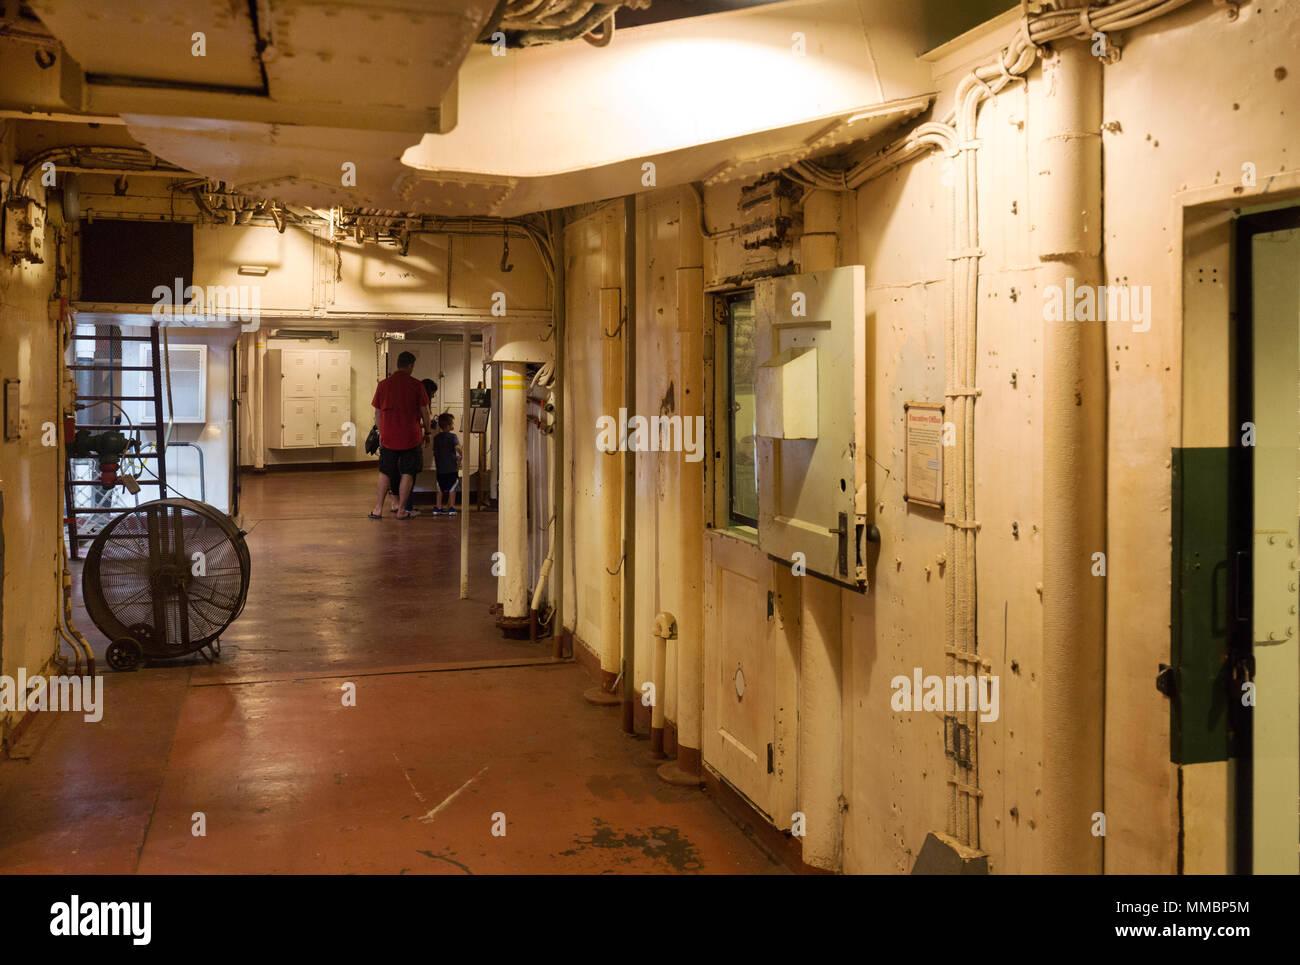 Below decks aboard the Battleship Texas; Houston, Texas USA - Stock Image